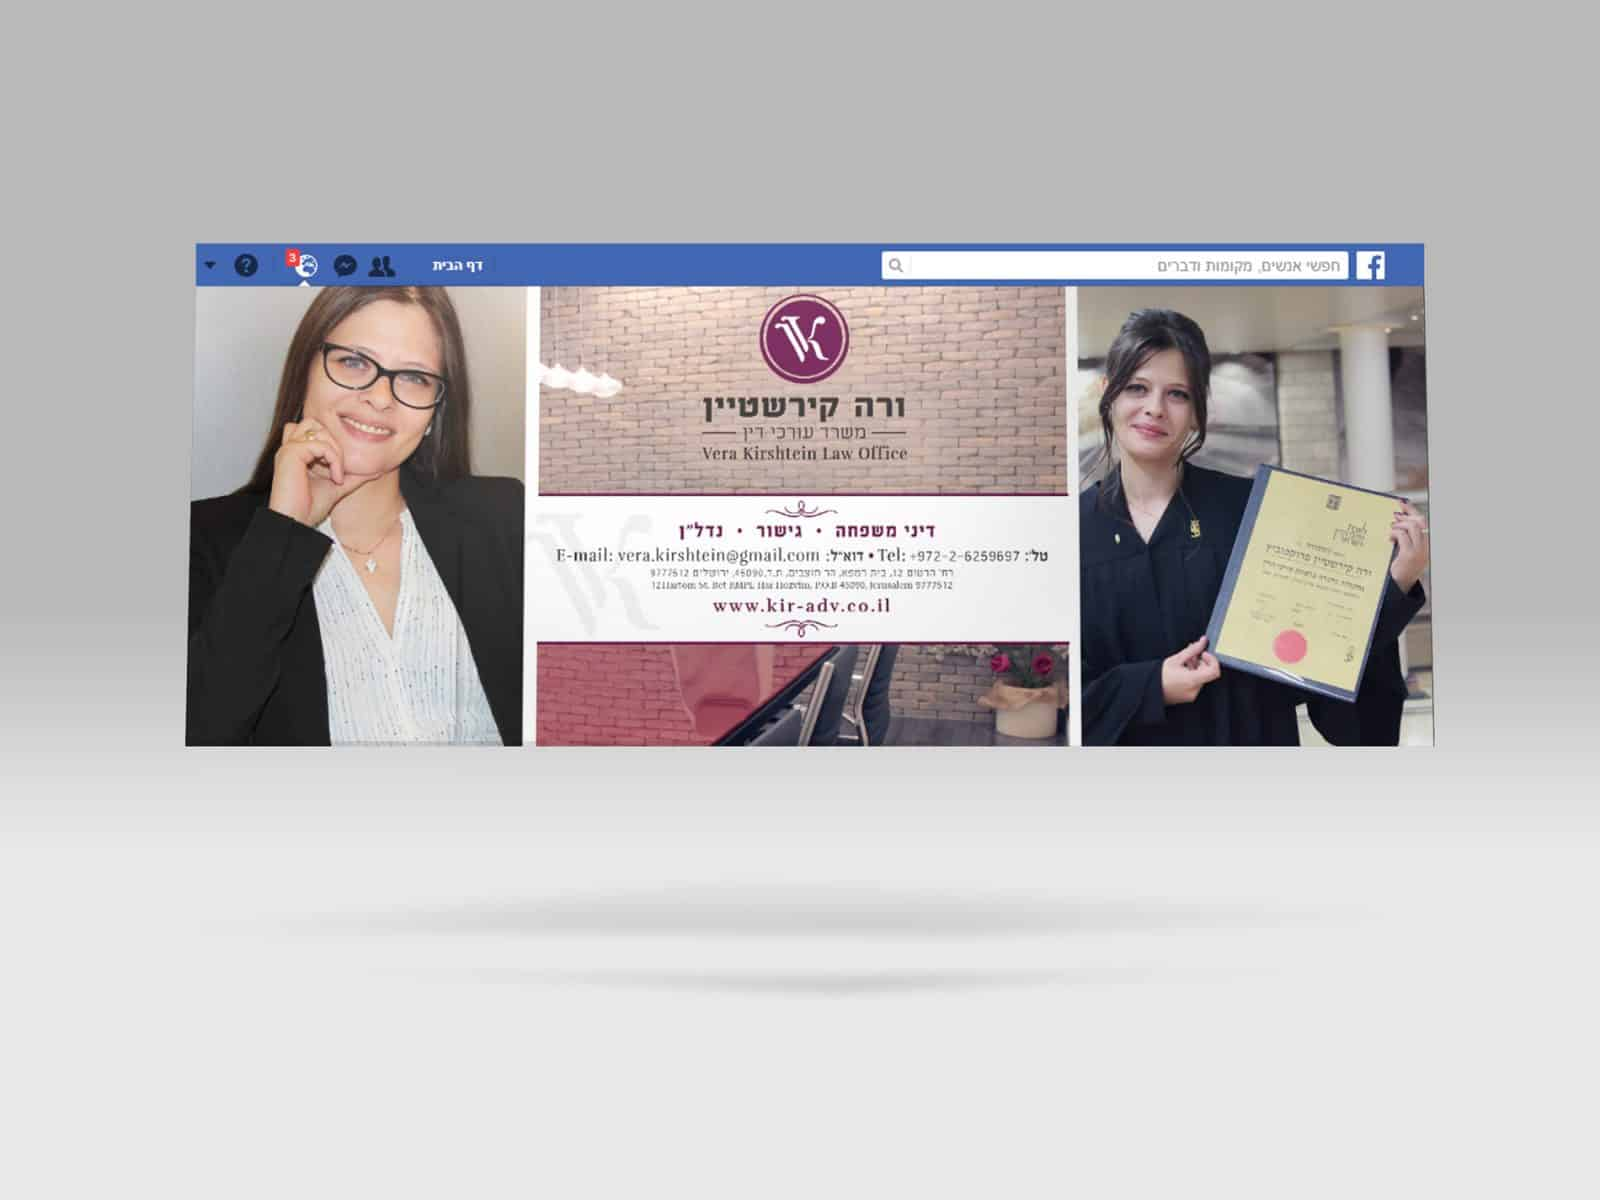 עיצוב-פייסבוק-לעורכת-דין